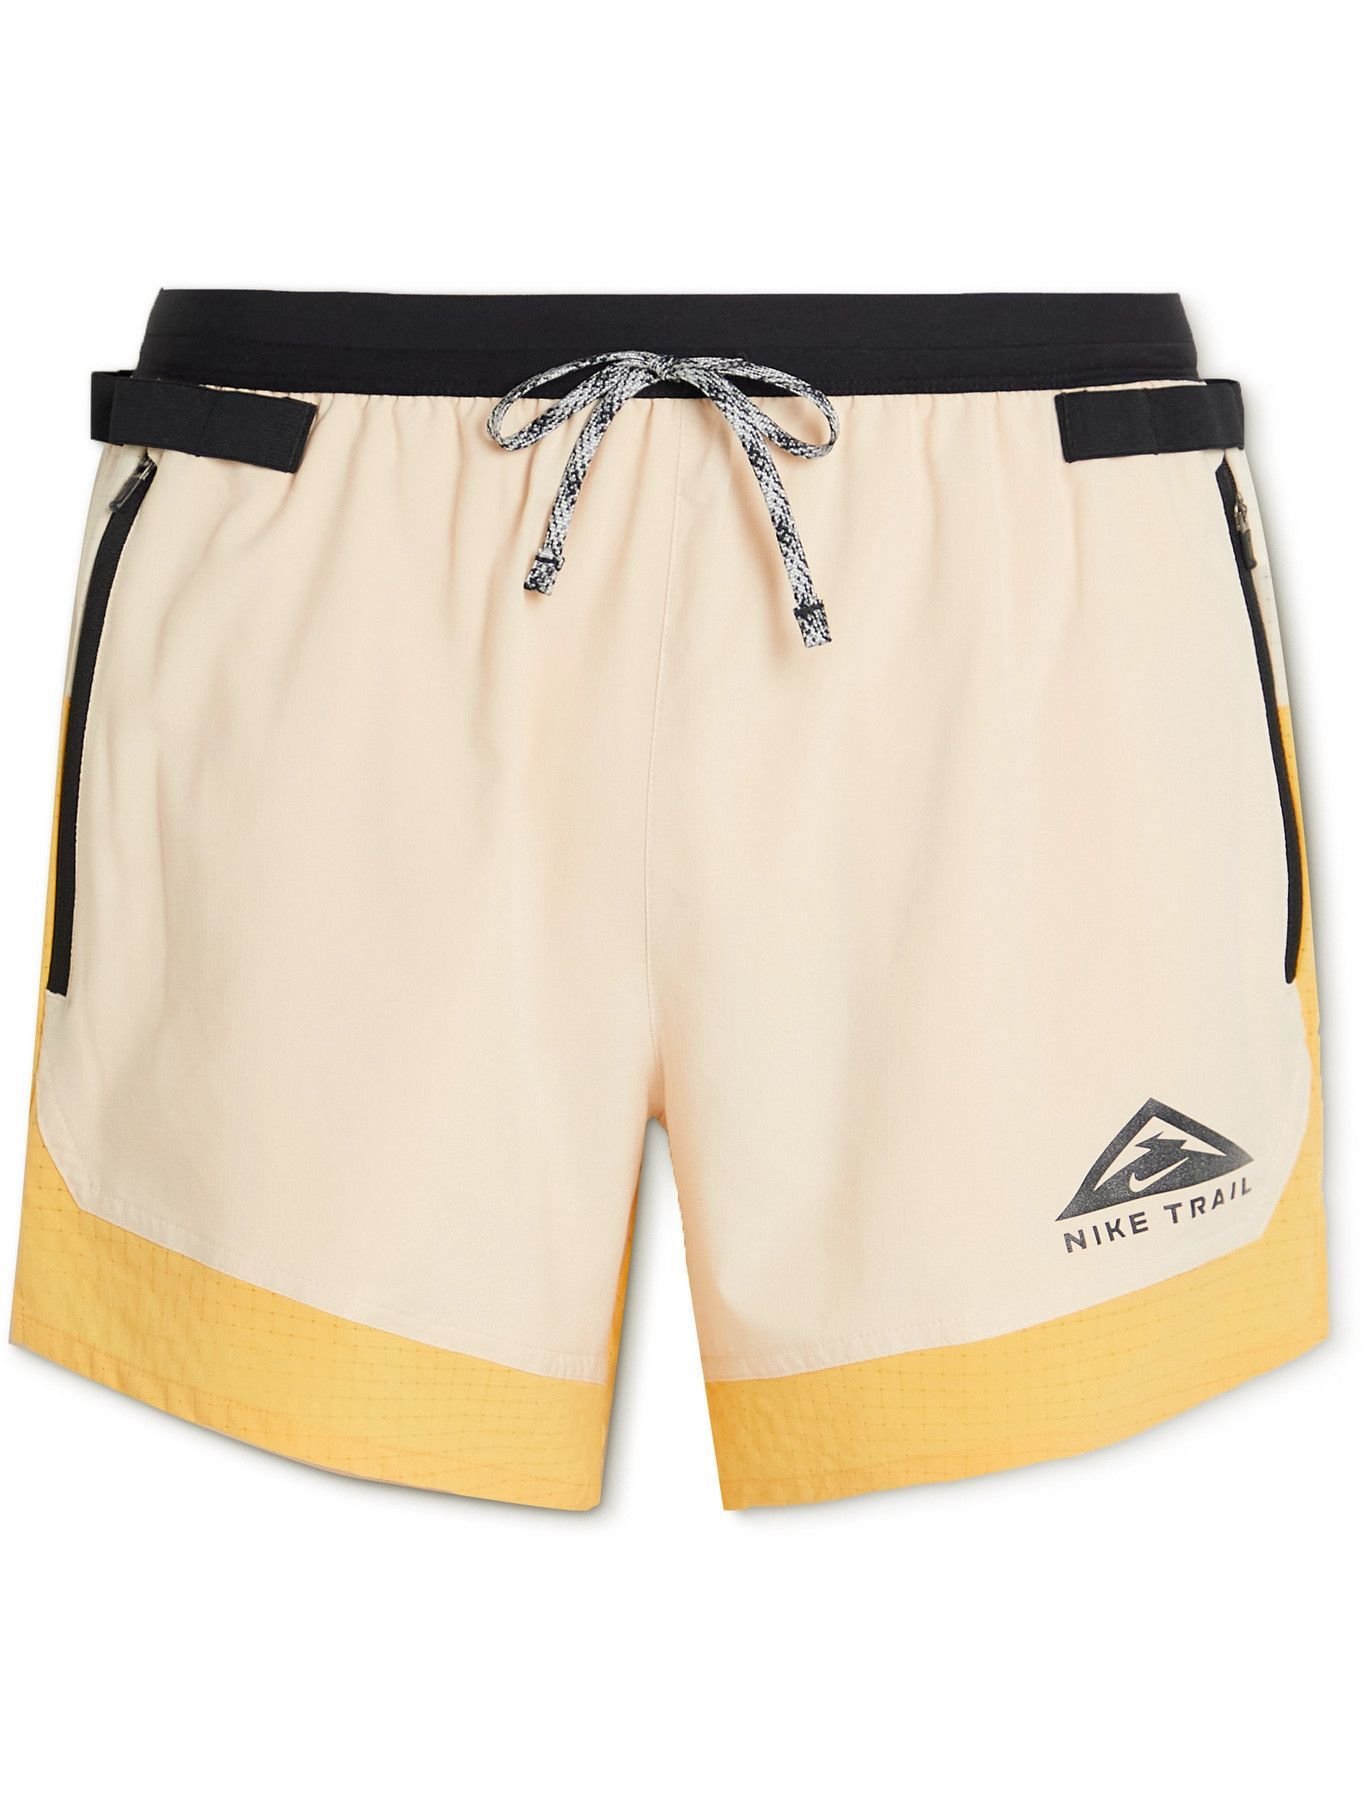 Photo: NIKE RUNNING - Flex Stride Colour-Block Dri-FIT Ripstop Shorts - Yellow